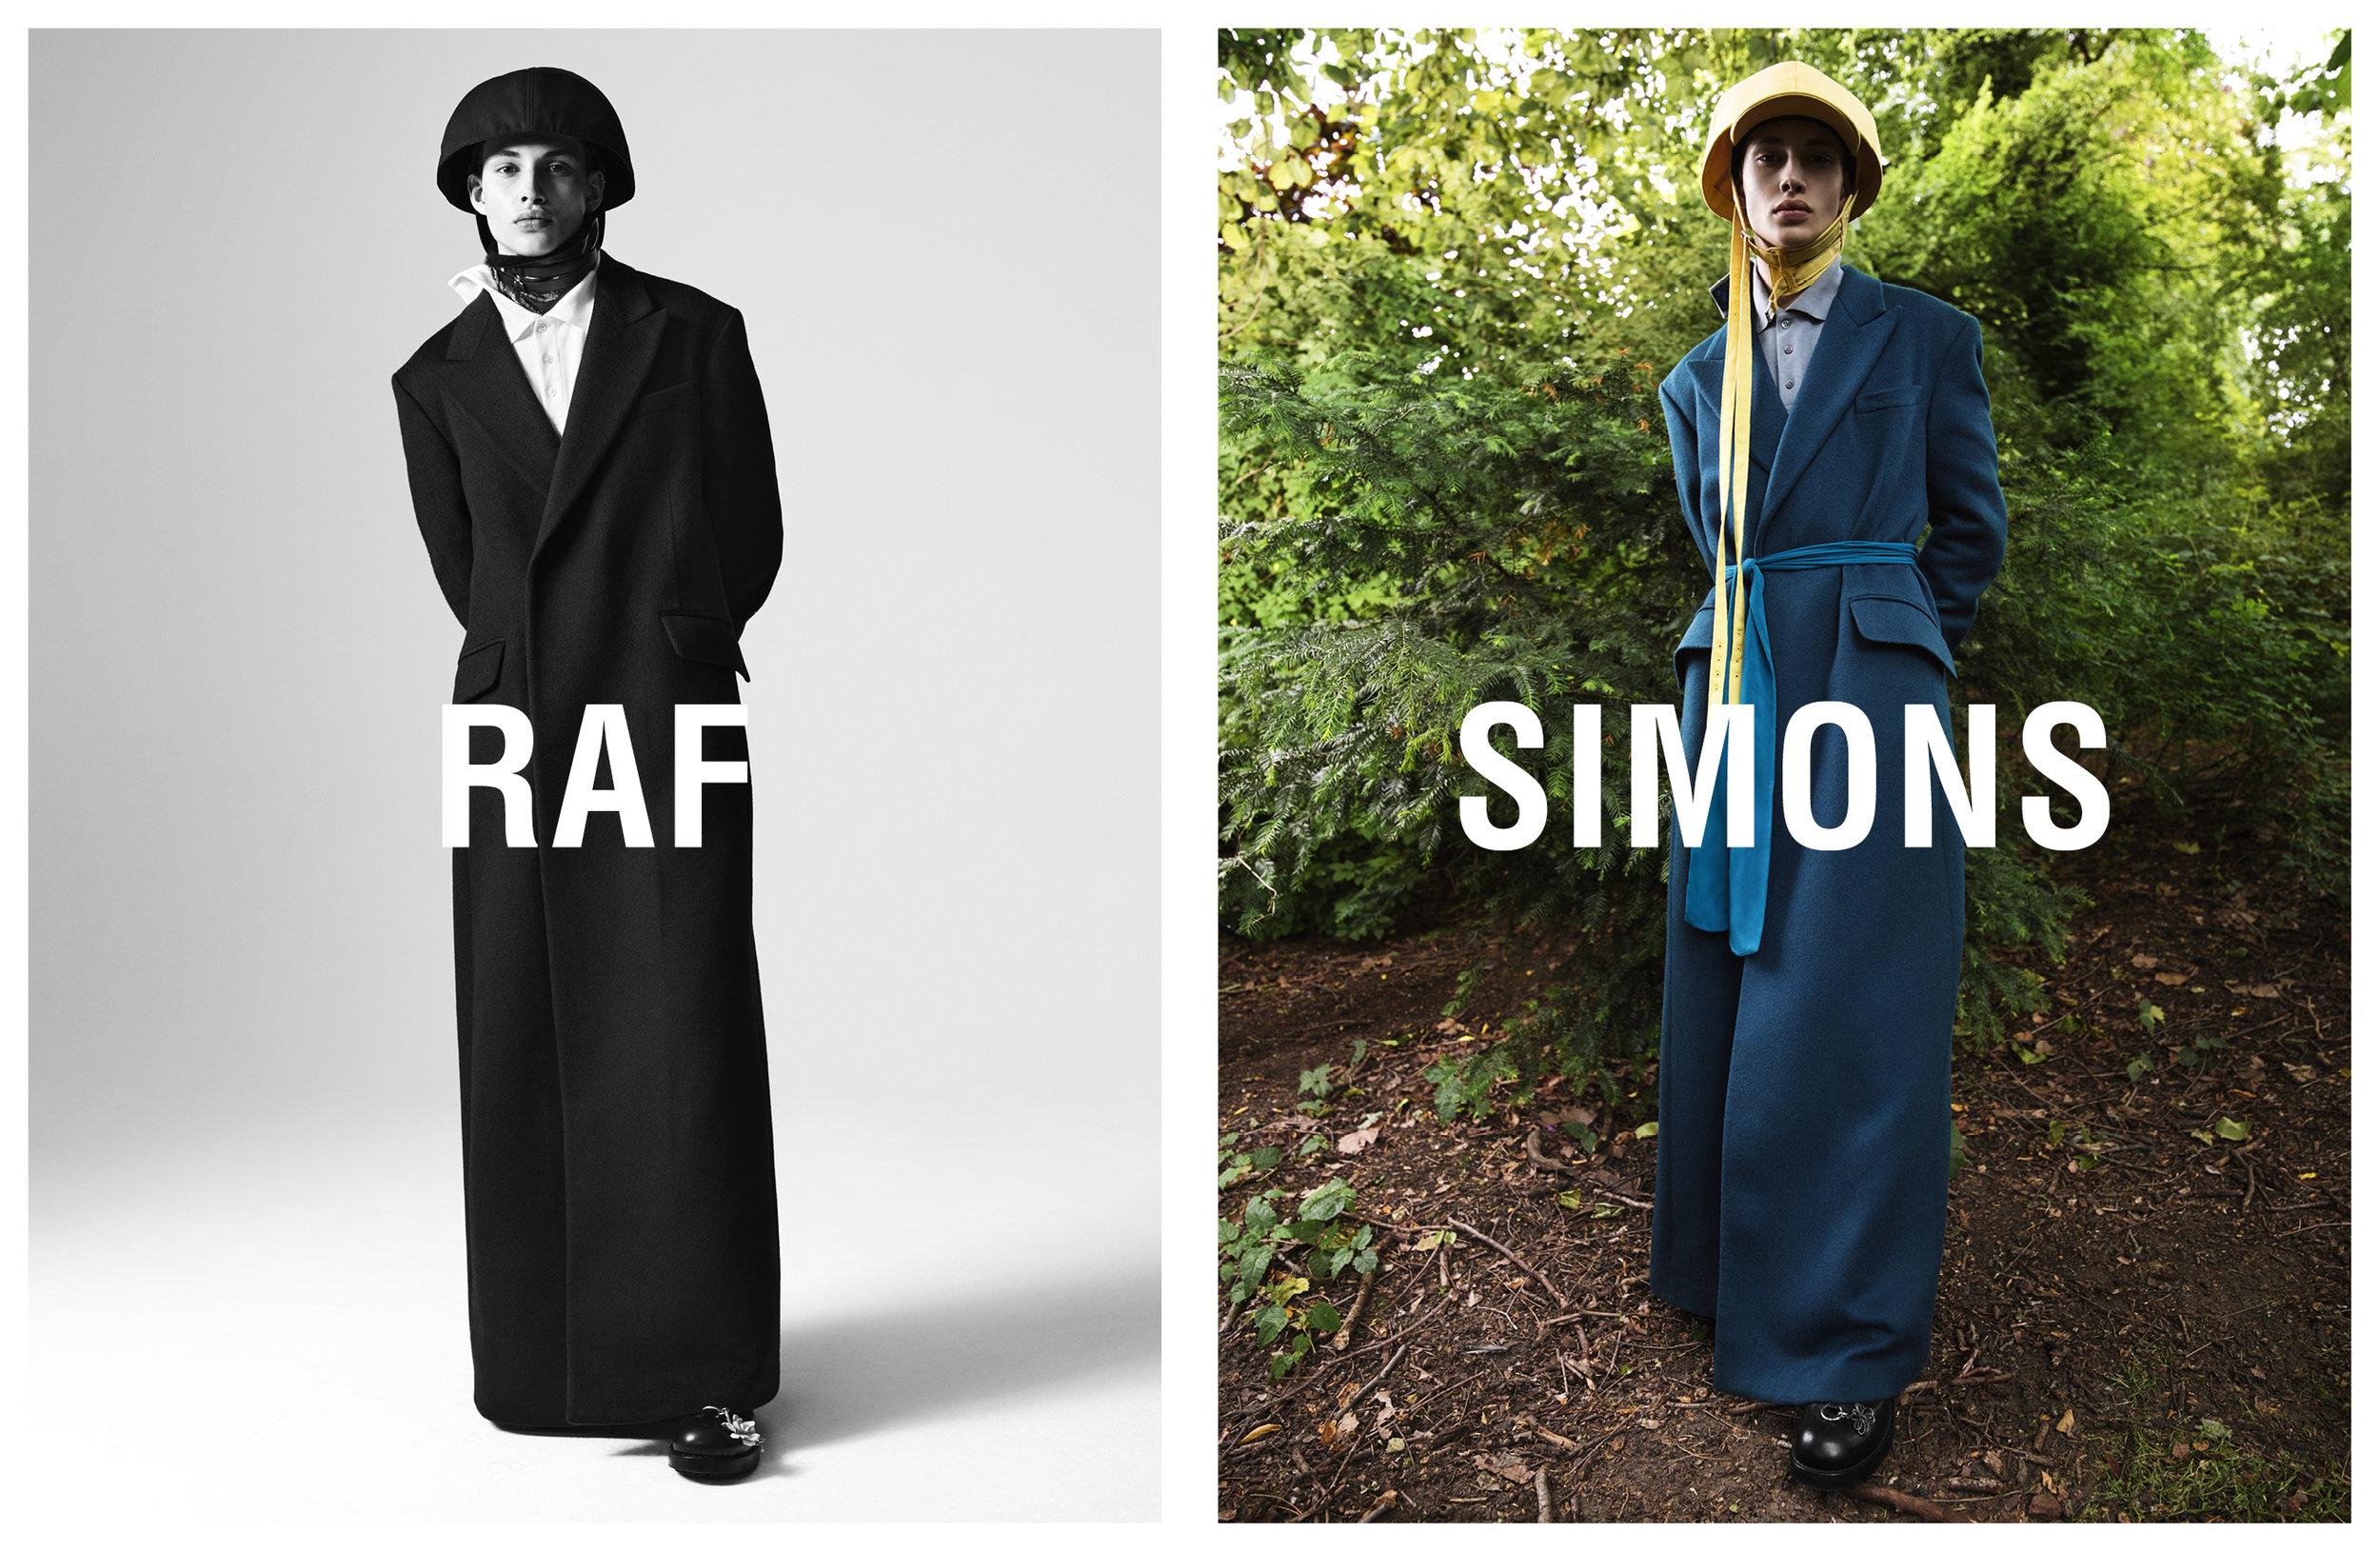 raf_simons_fall_2019_campaign2.jpg